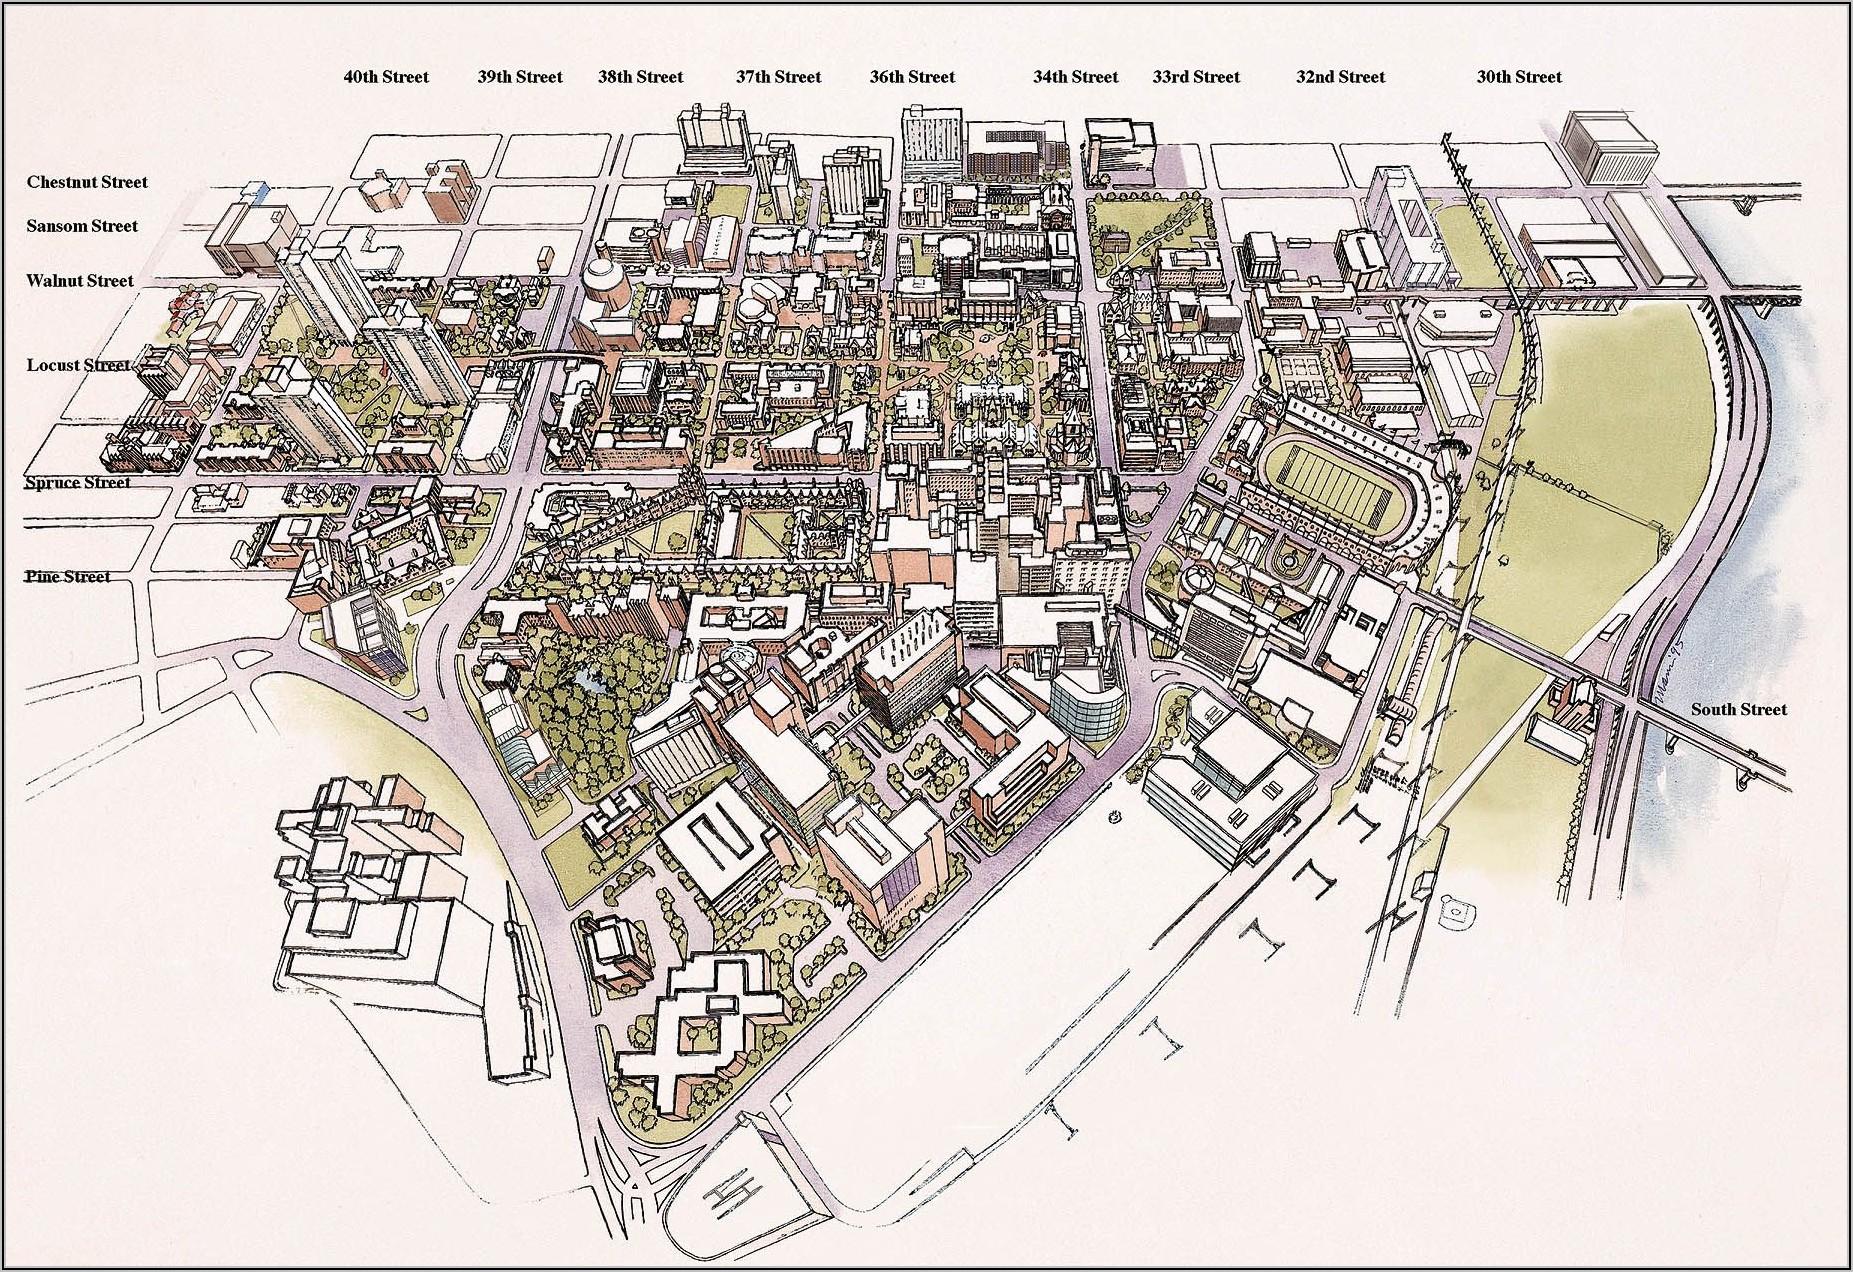 Penn State University Park Campus Map 2018